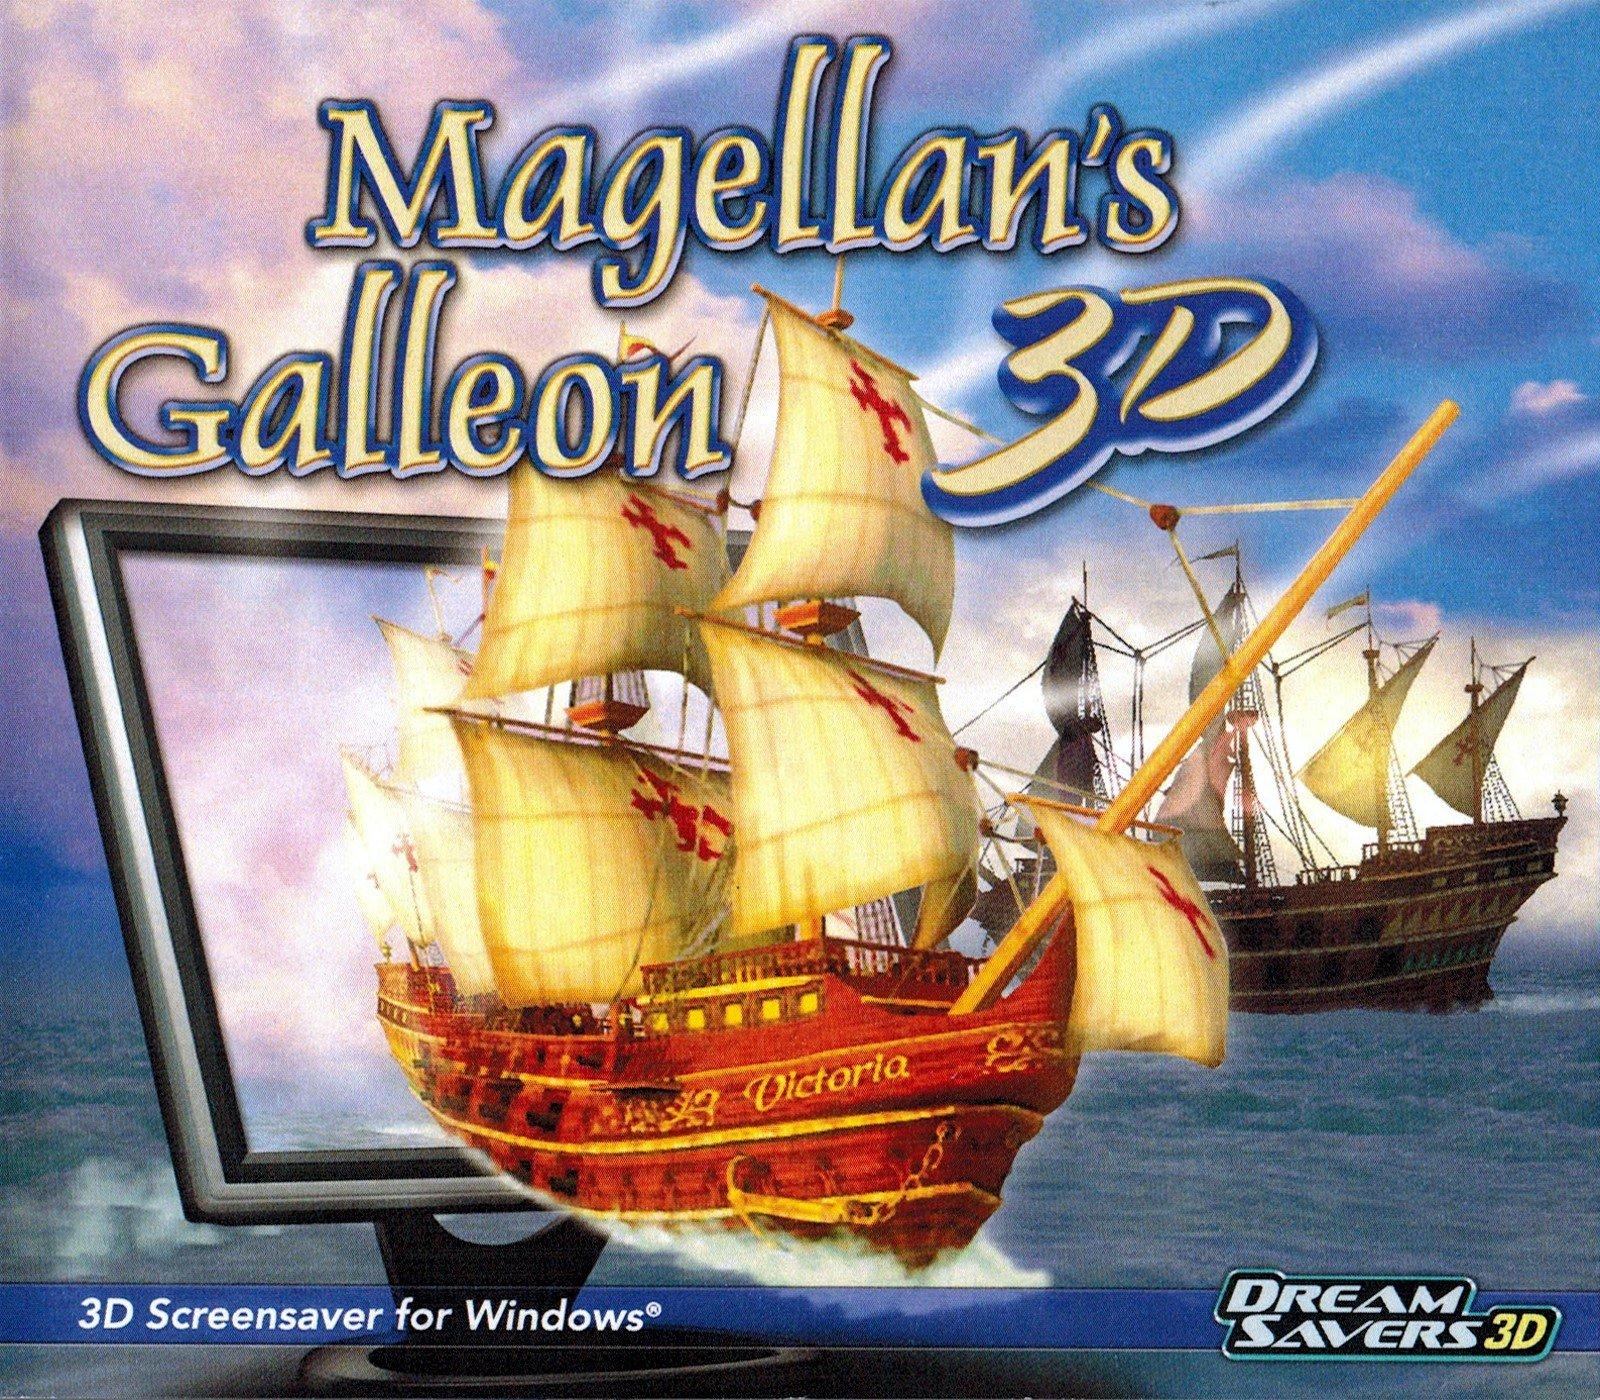 Magellan''s Galleon 3D Screensaver by Dream Saver 3D